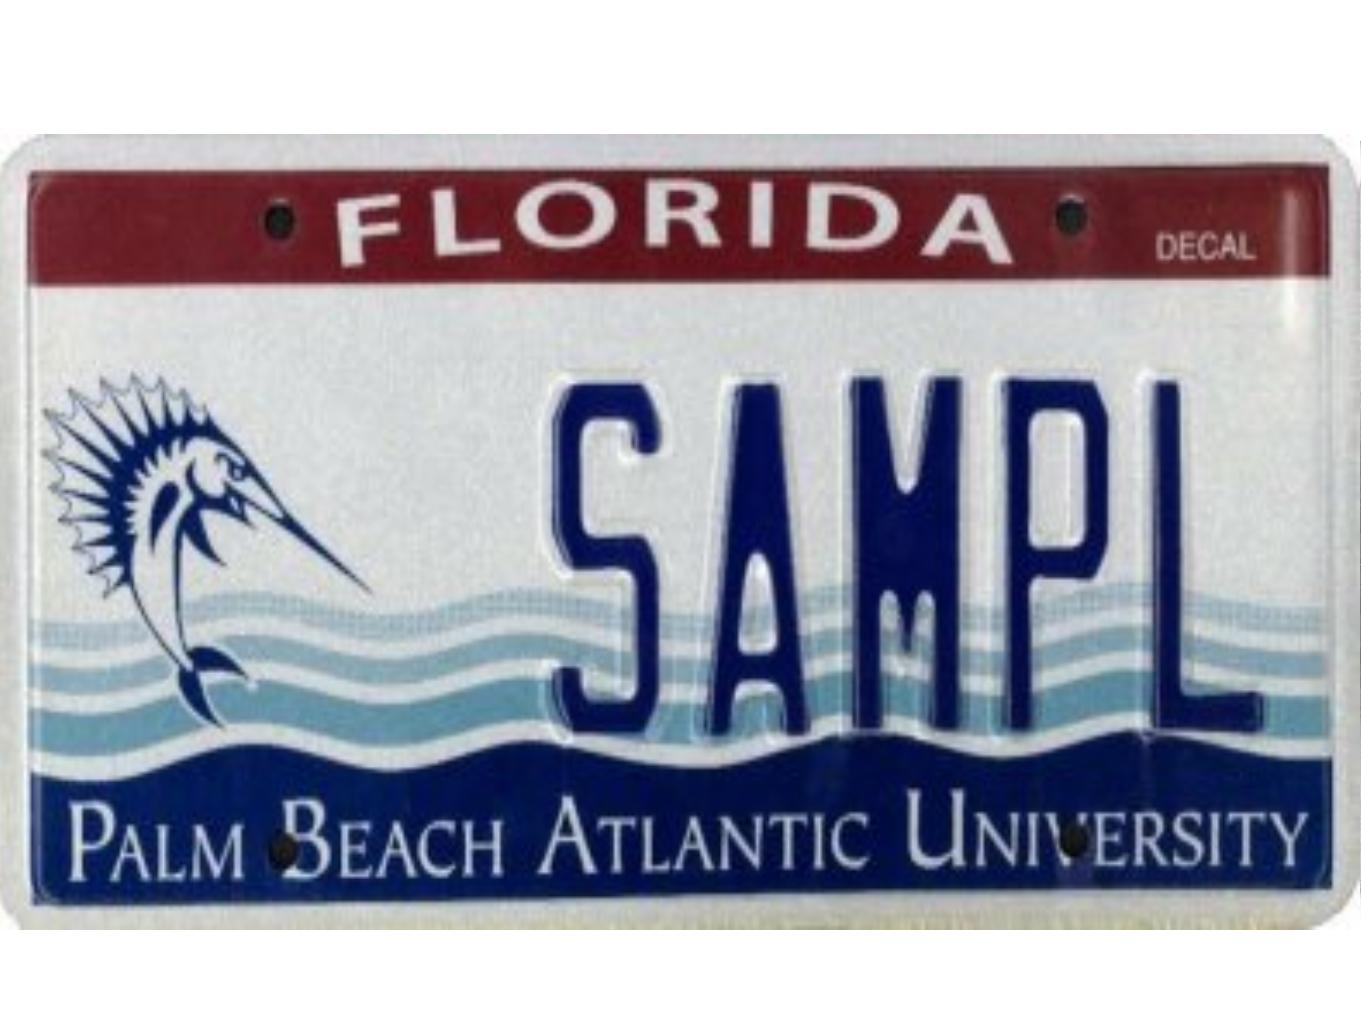 The Palm Beach Atlantic University license plate.